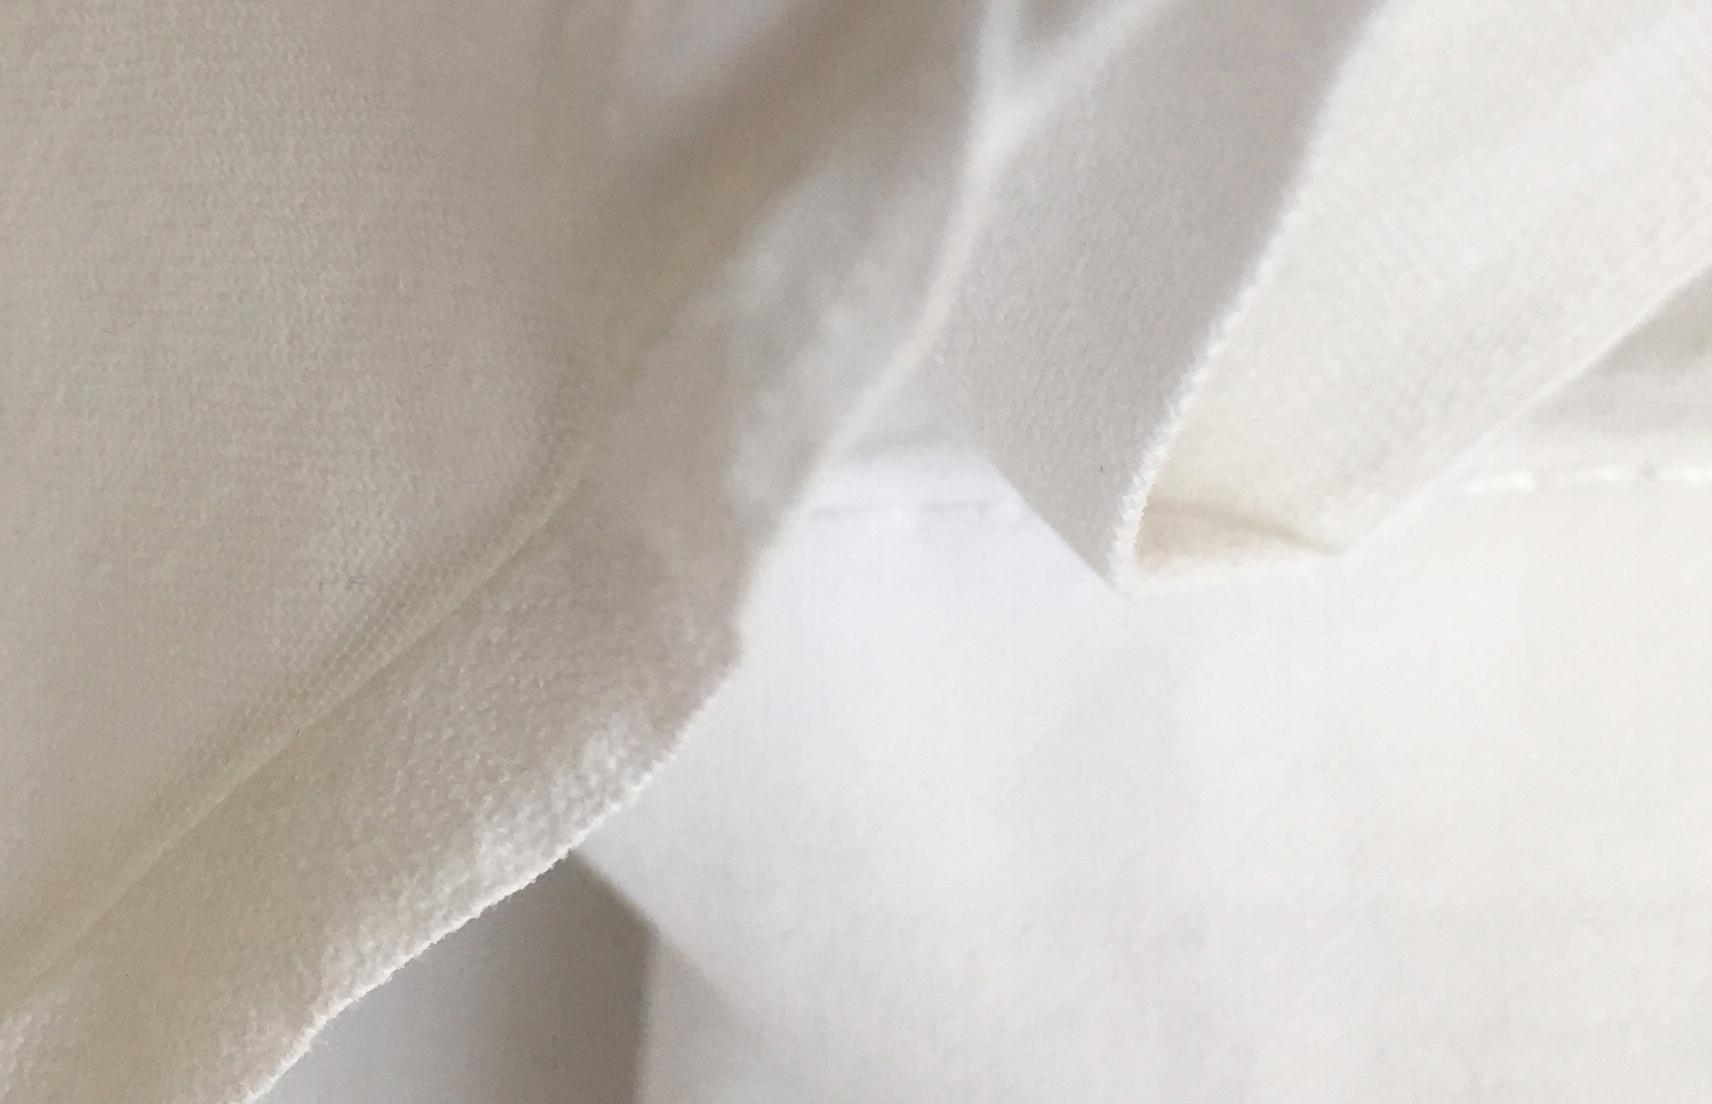 trapos sábana blanca algodón